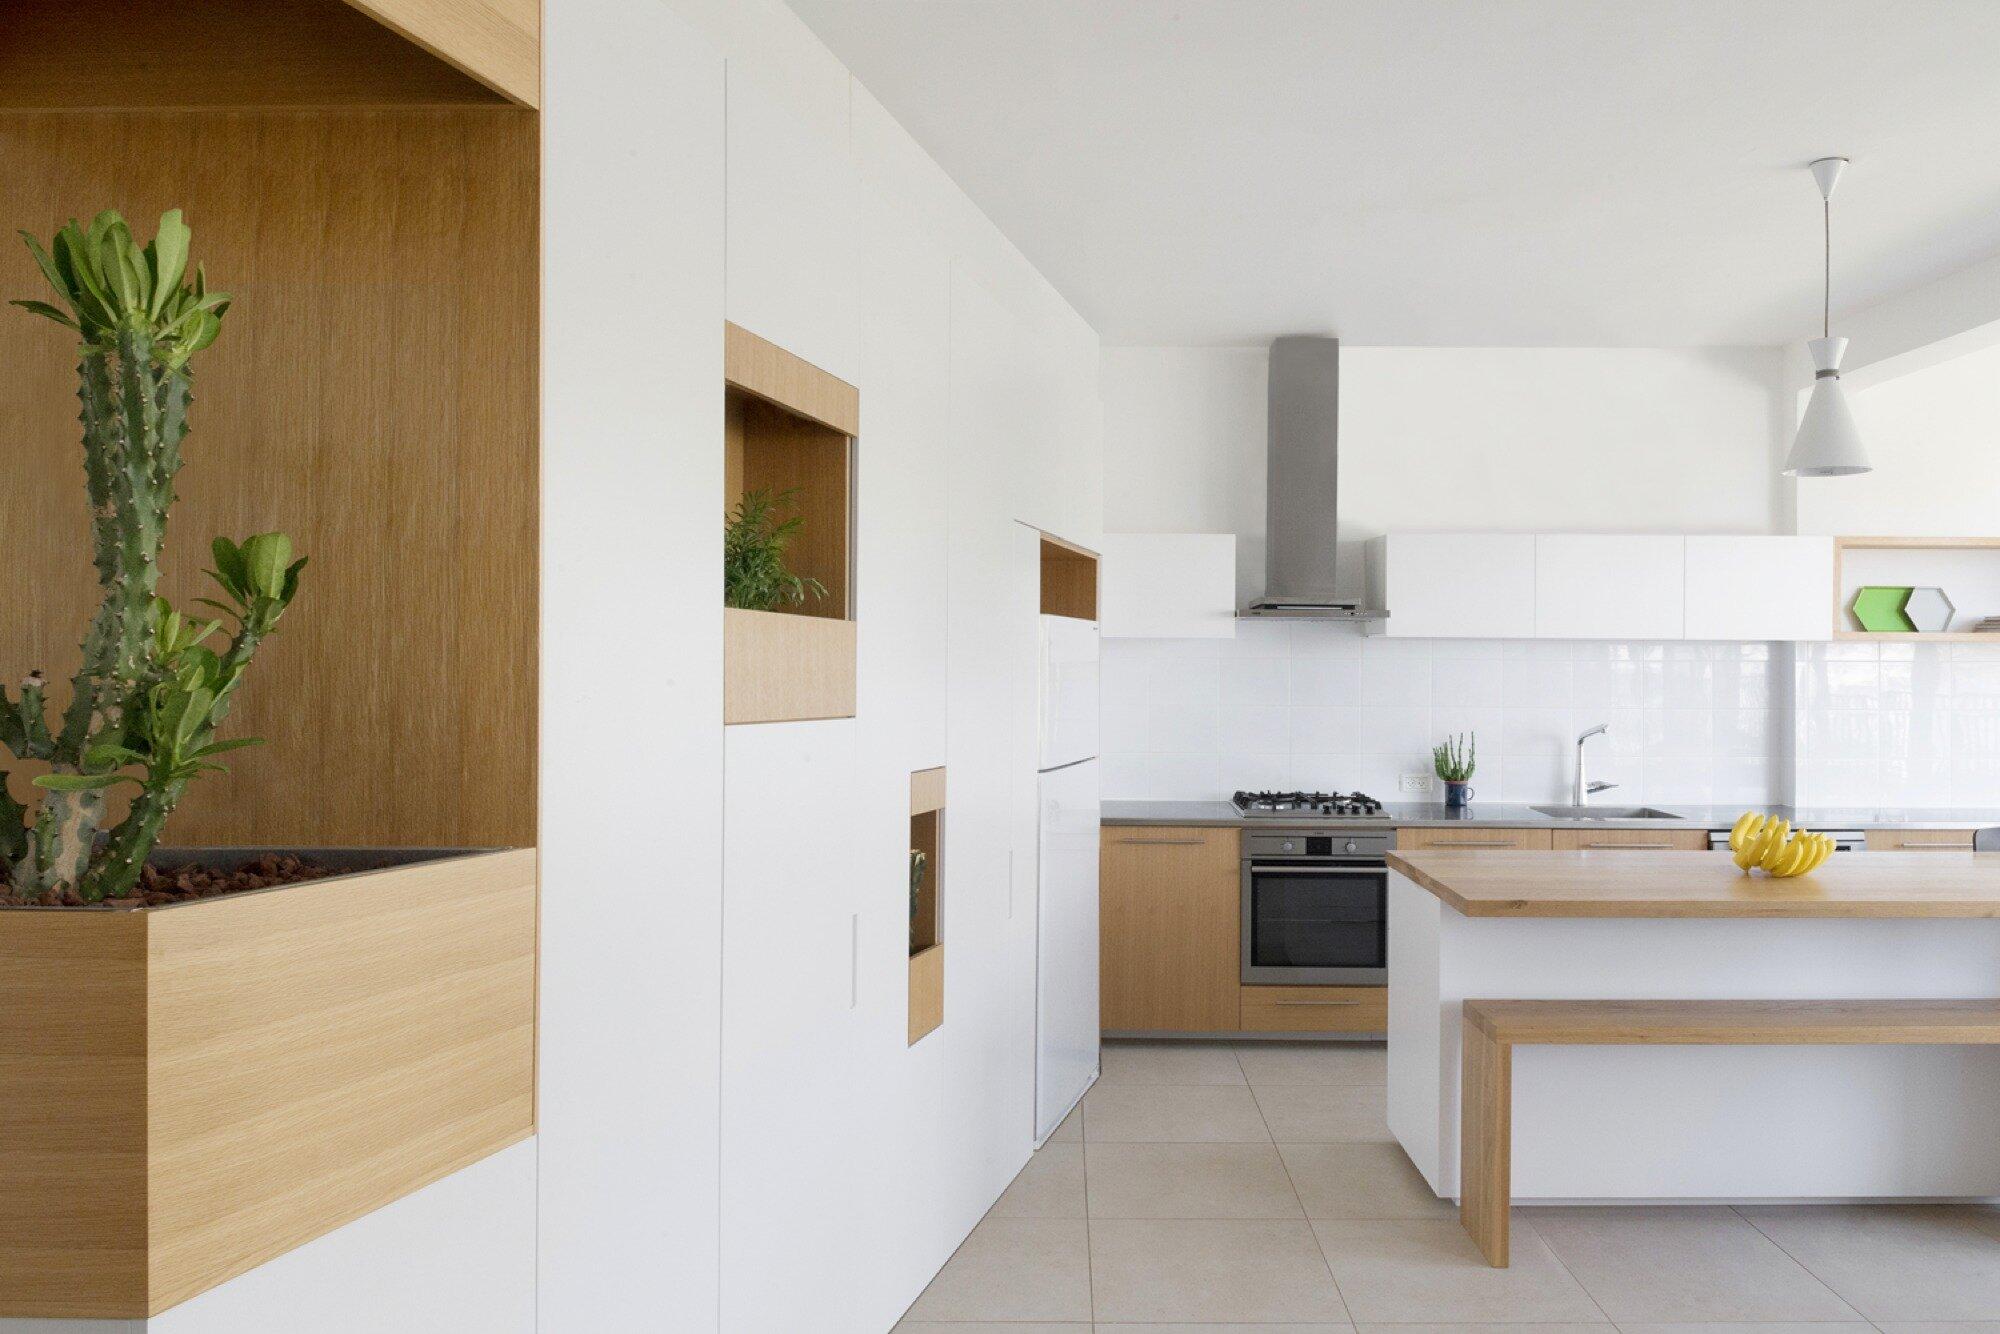 Apartment in Ramat Gan - Itai Palti - Israel - Living Area - Humble Homes